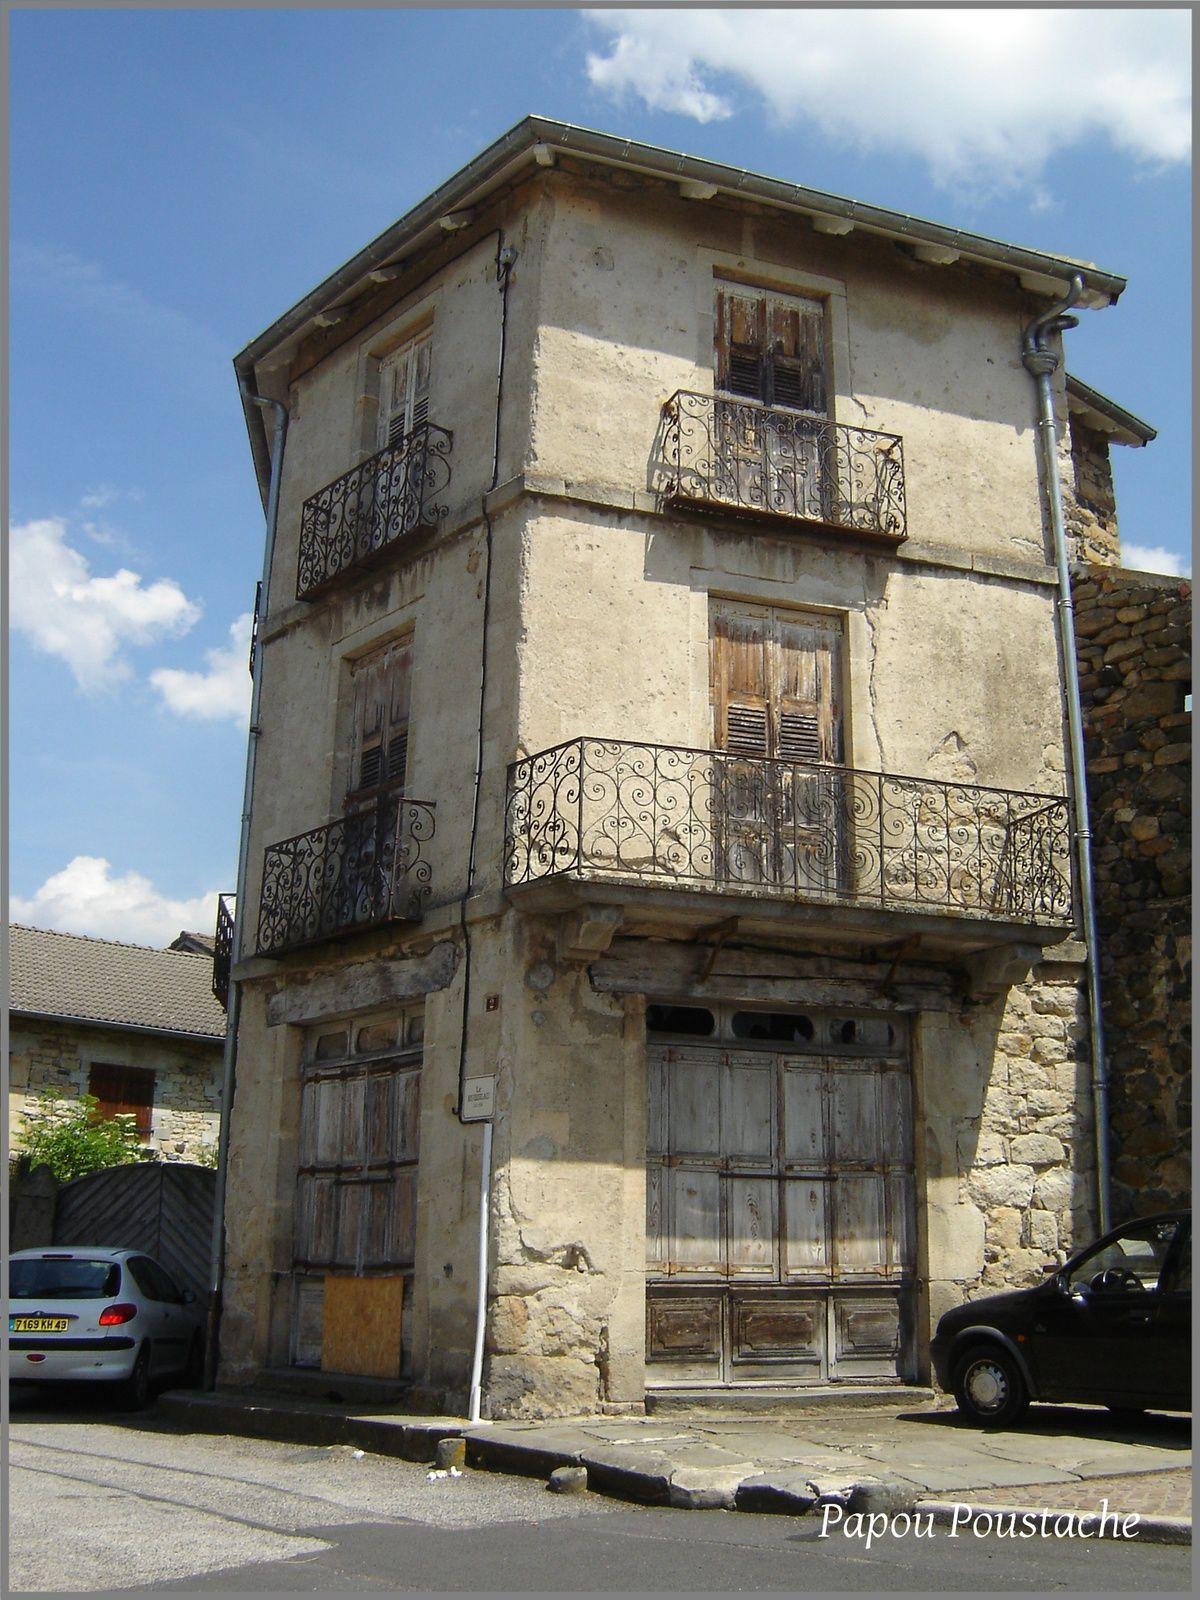 Balade dans les rues de St Julien Chapteuil